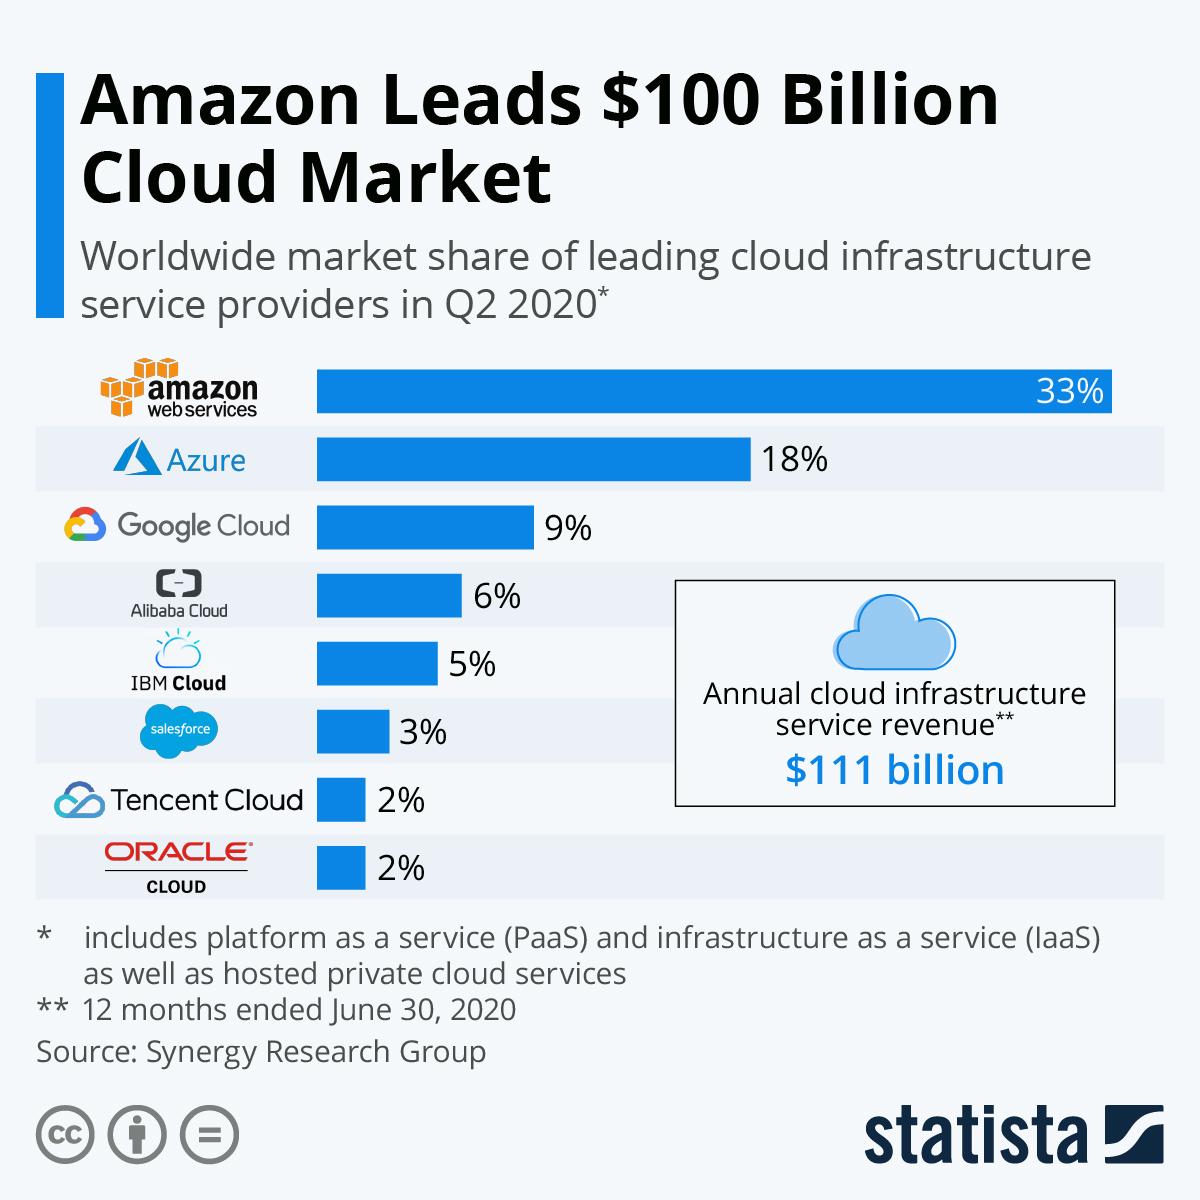 annual cloud infrastructure service revenue